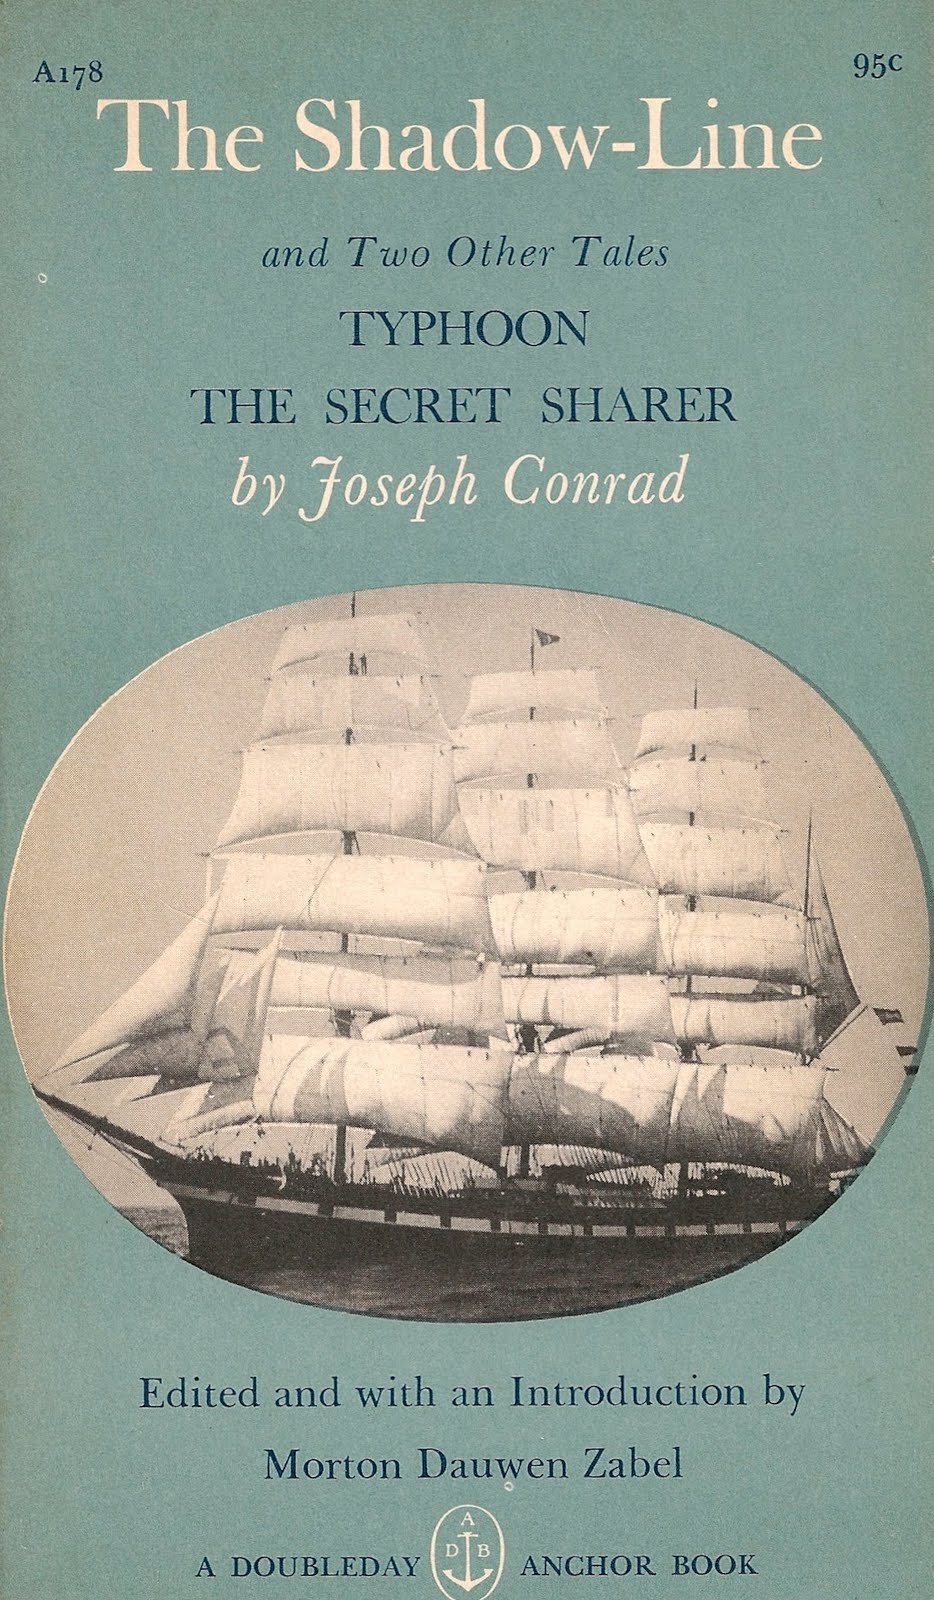 conrad the shadow line  Dreamers Rise: Conrad at Anchor